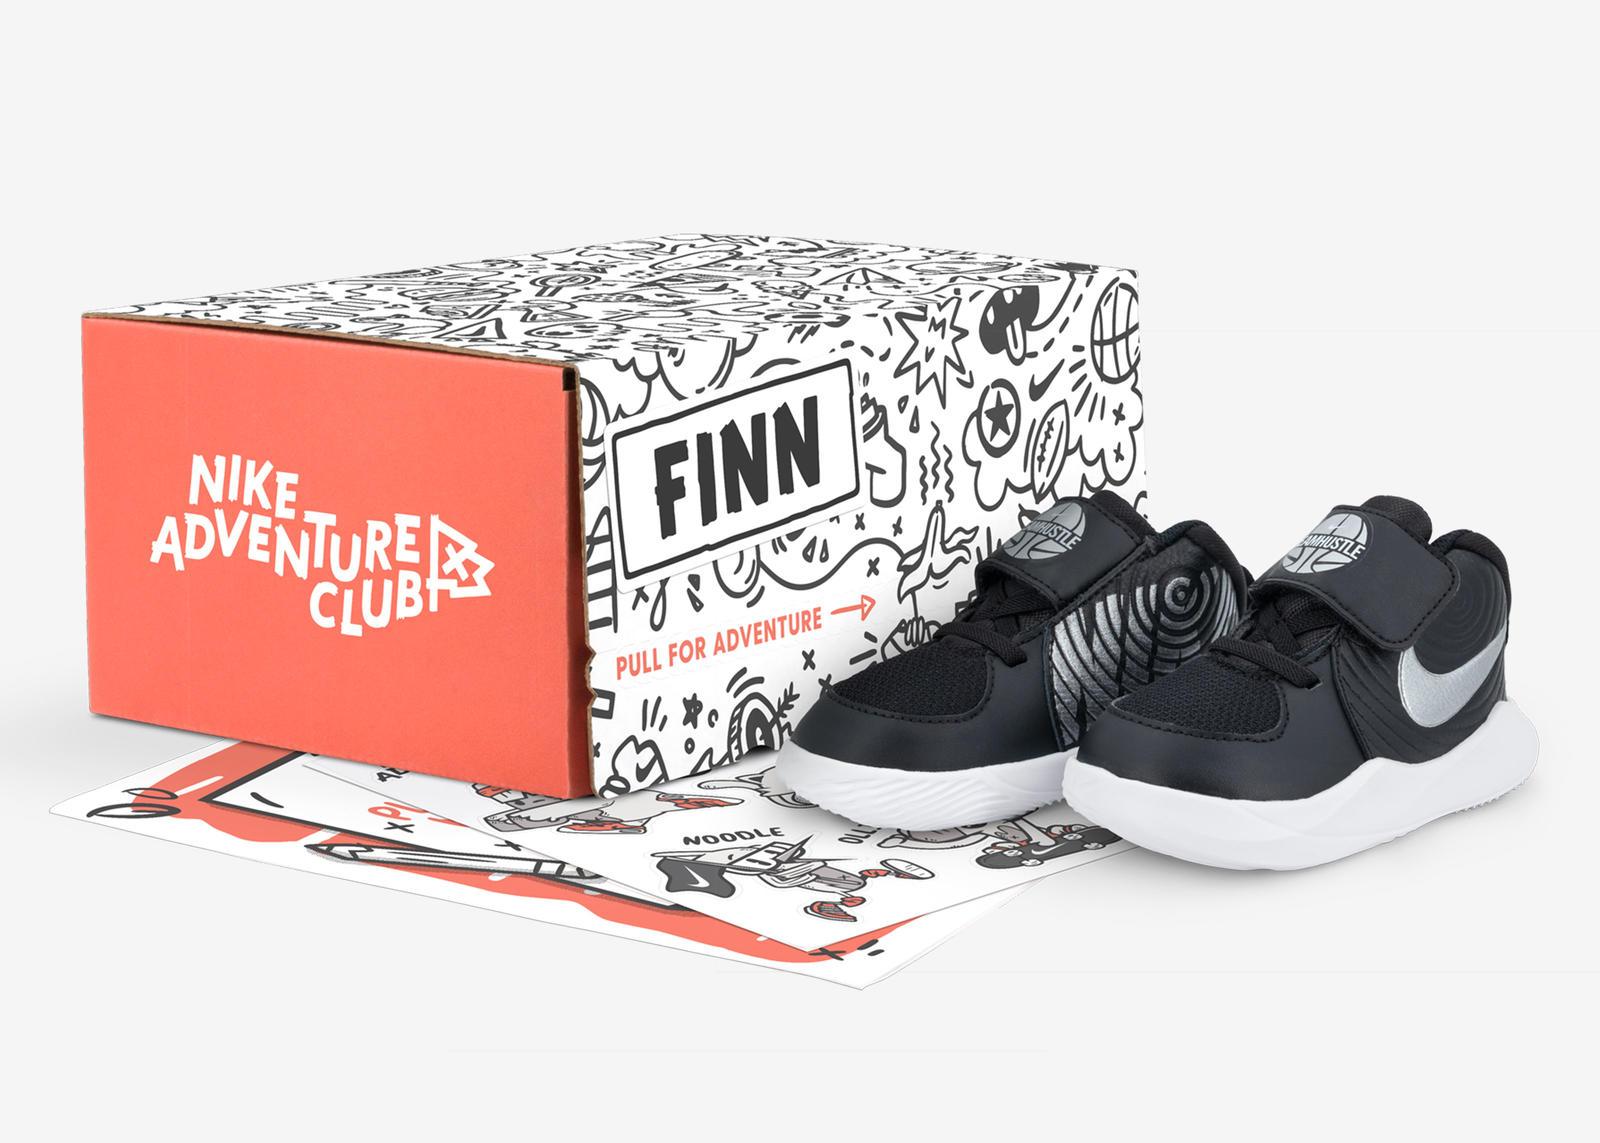 Nike Adventure Club